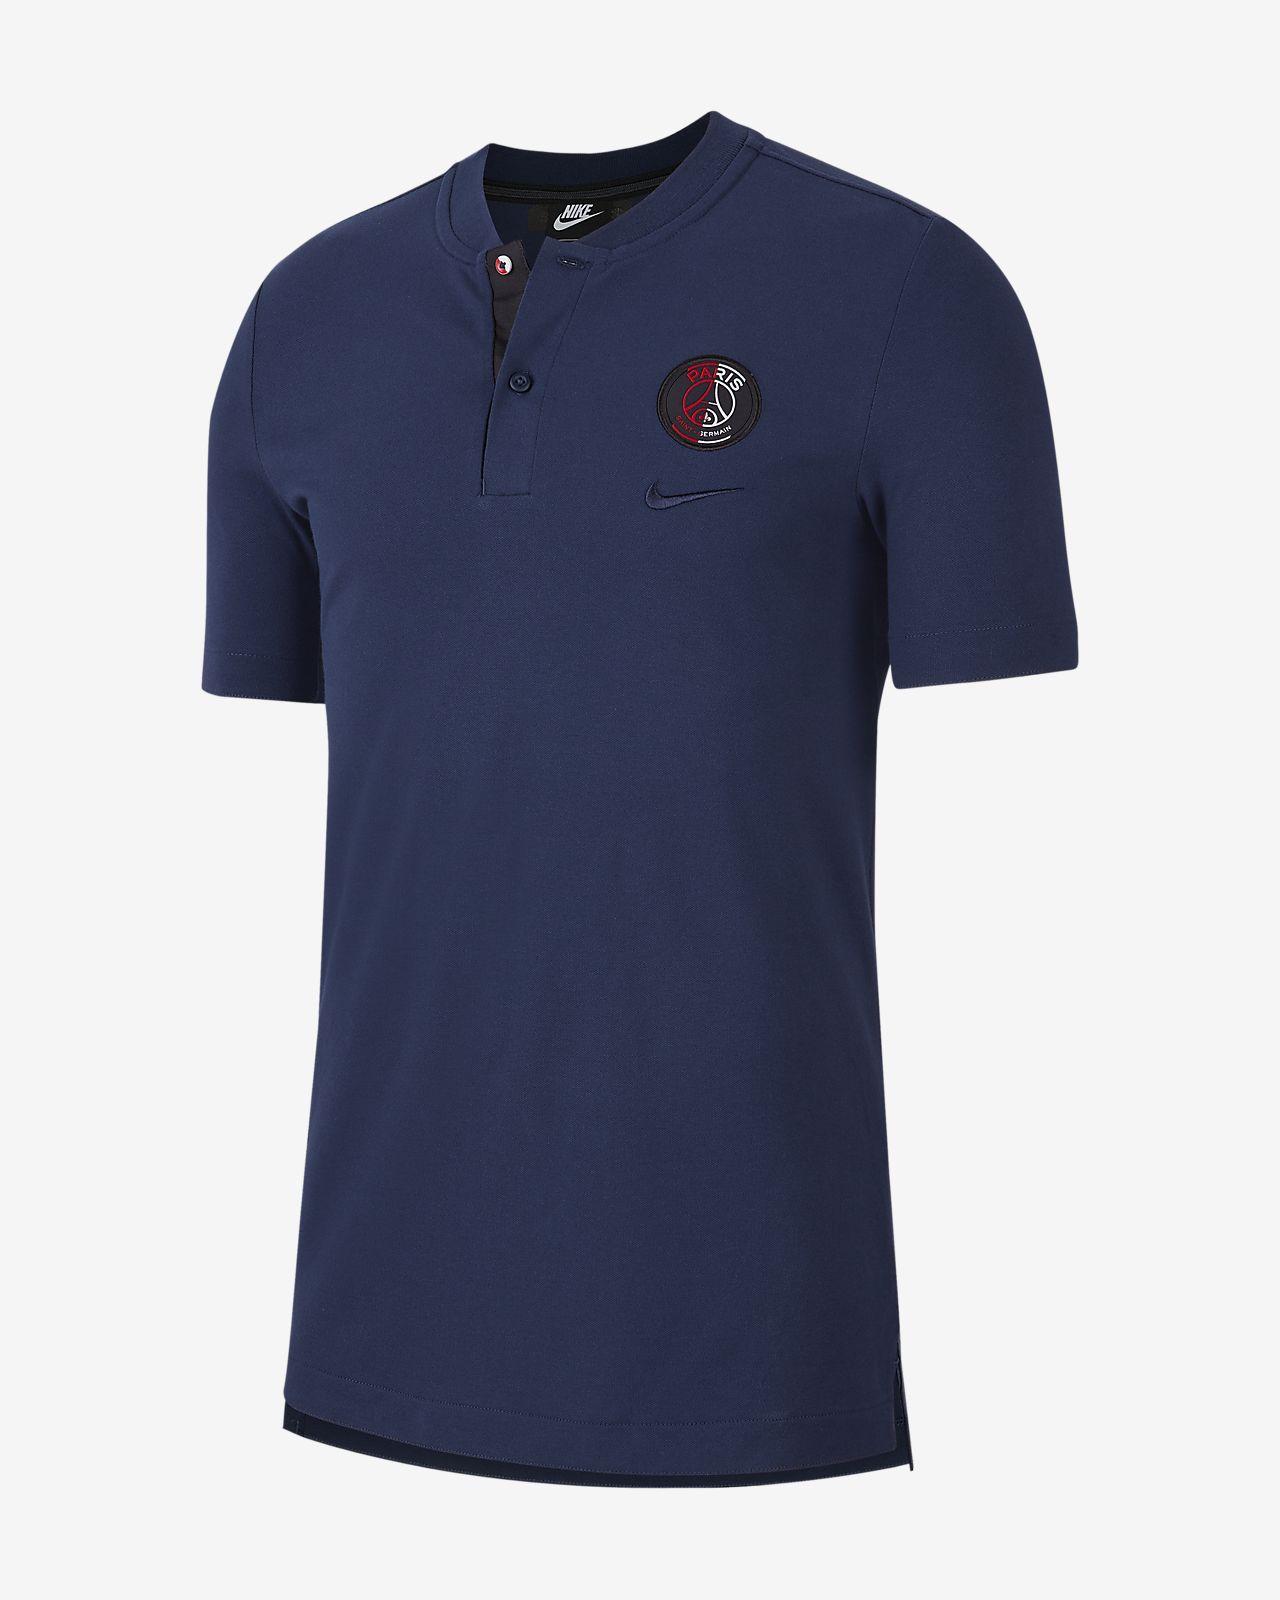 Męska koszulka piłkarska polo Paris Saint-Germain